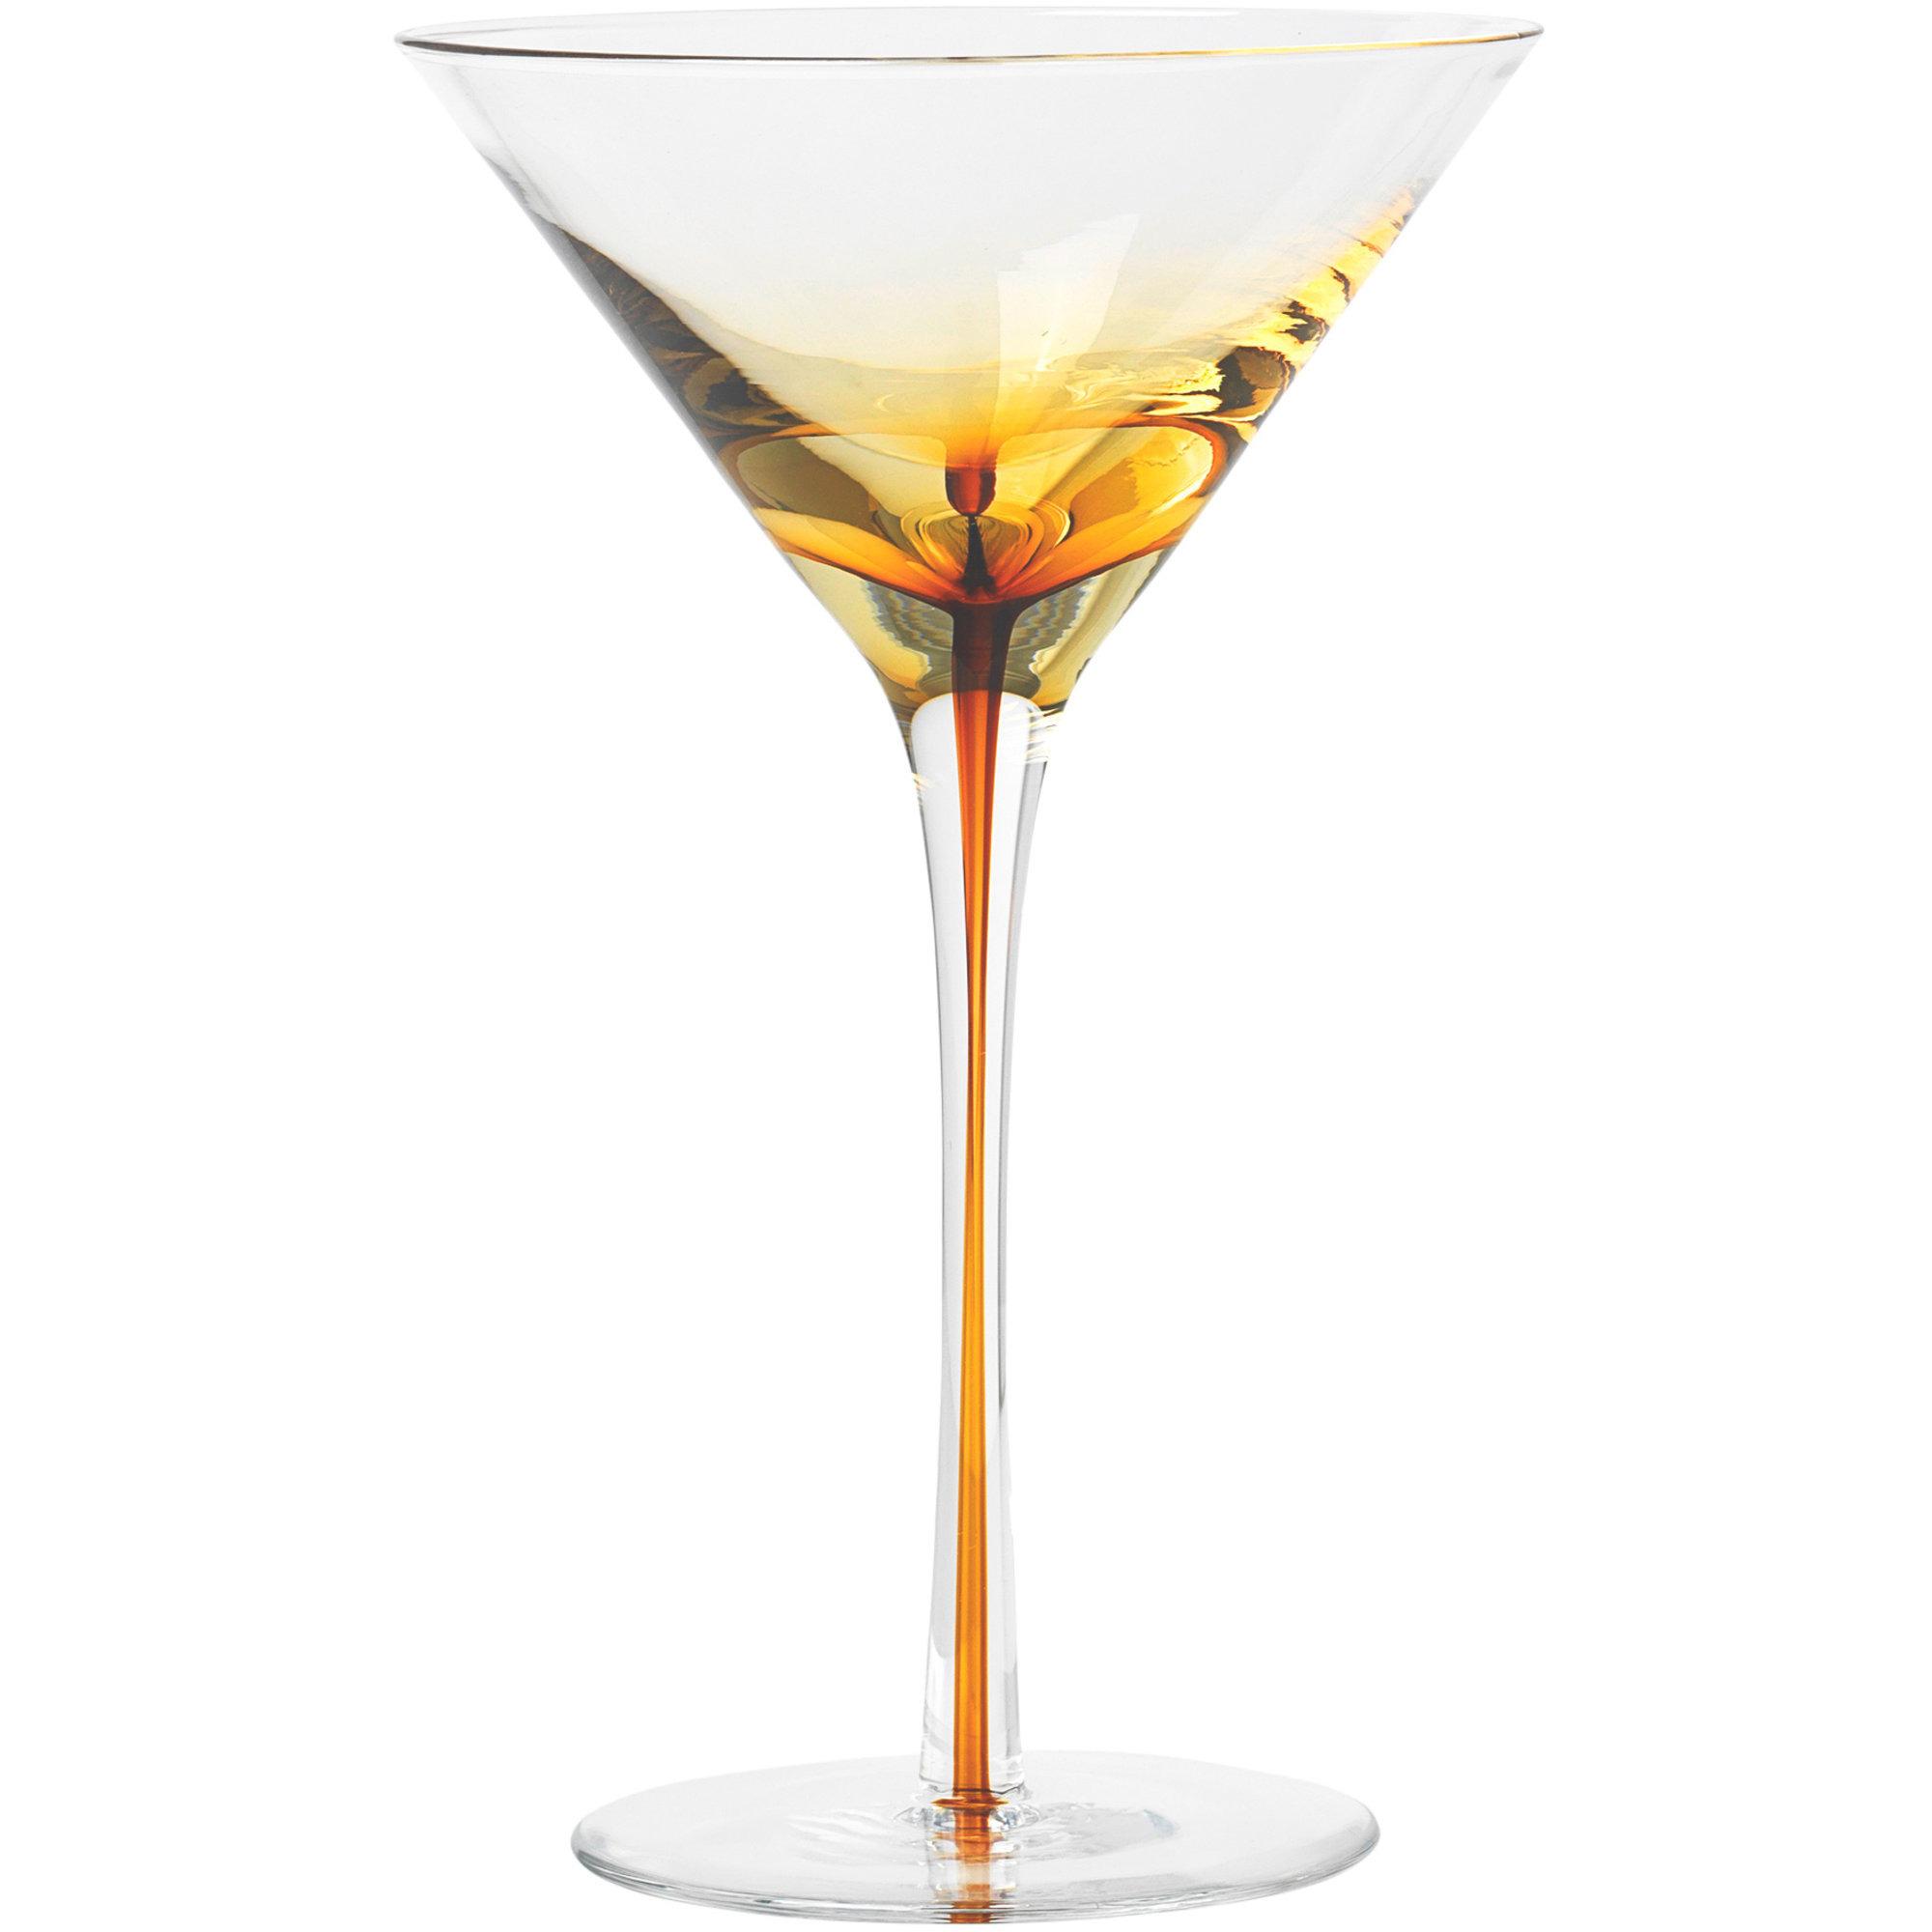 Broste Copenhagen 'Amber' Munblåst Martiniglas